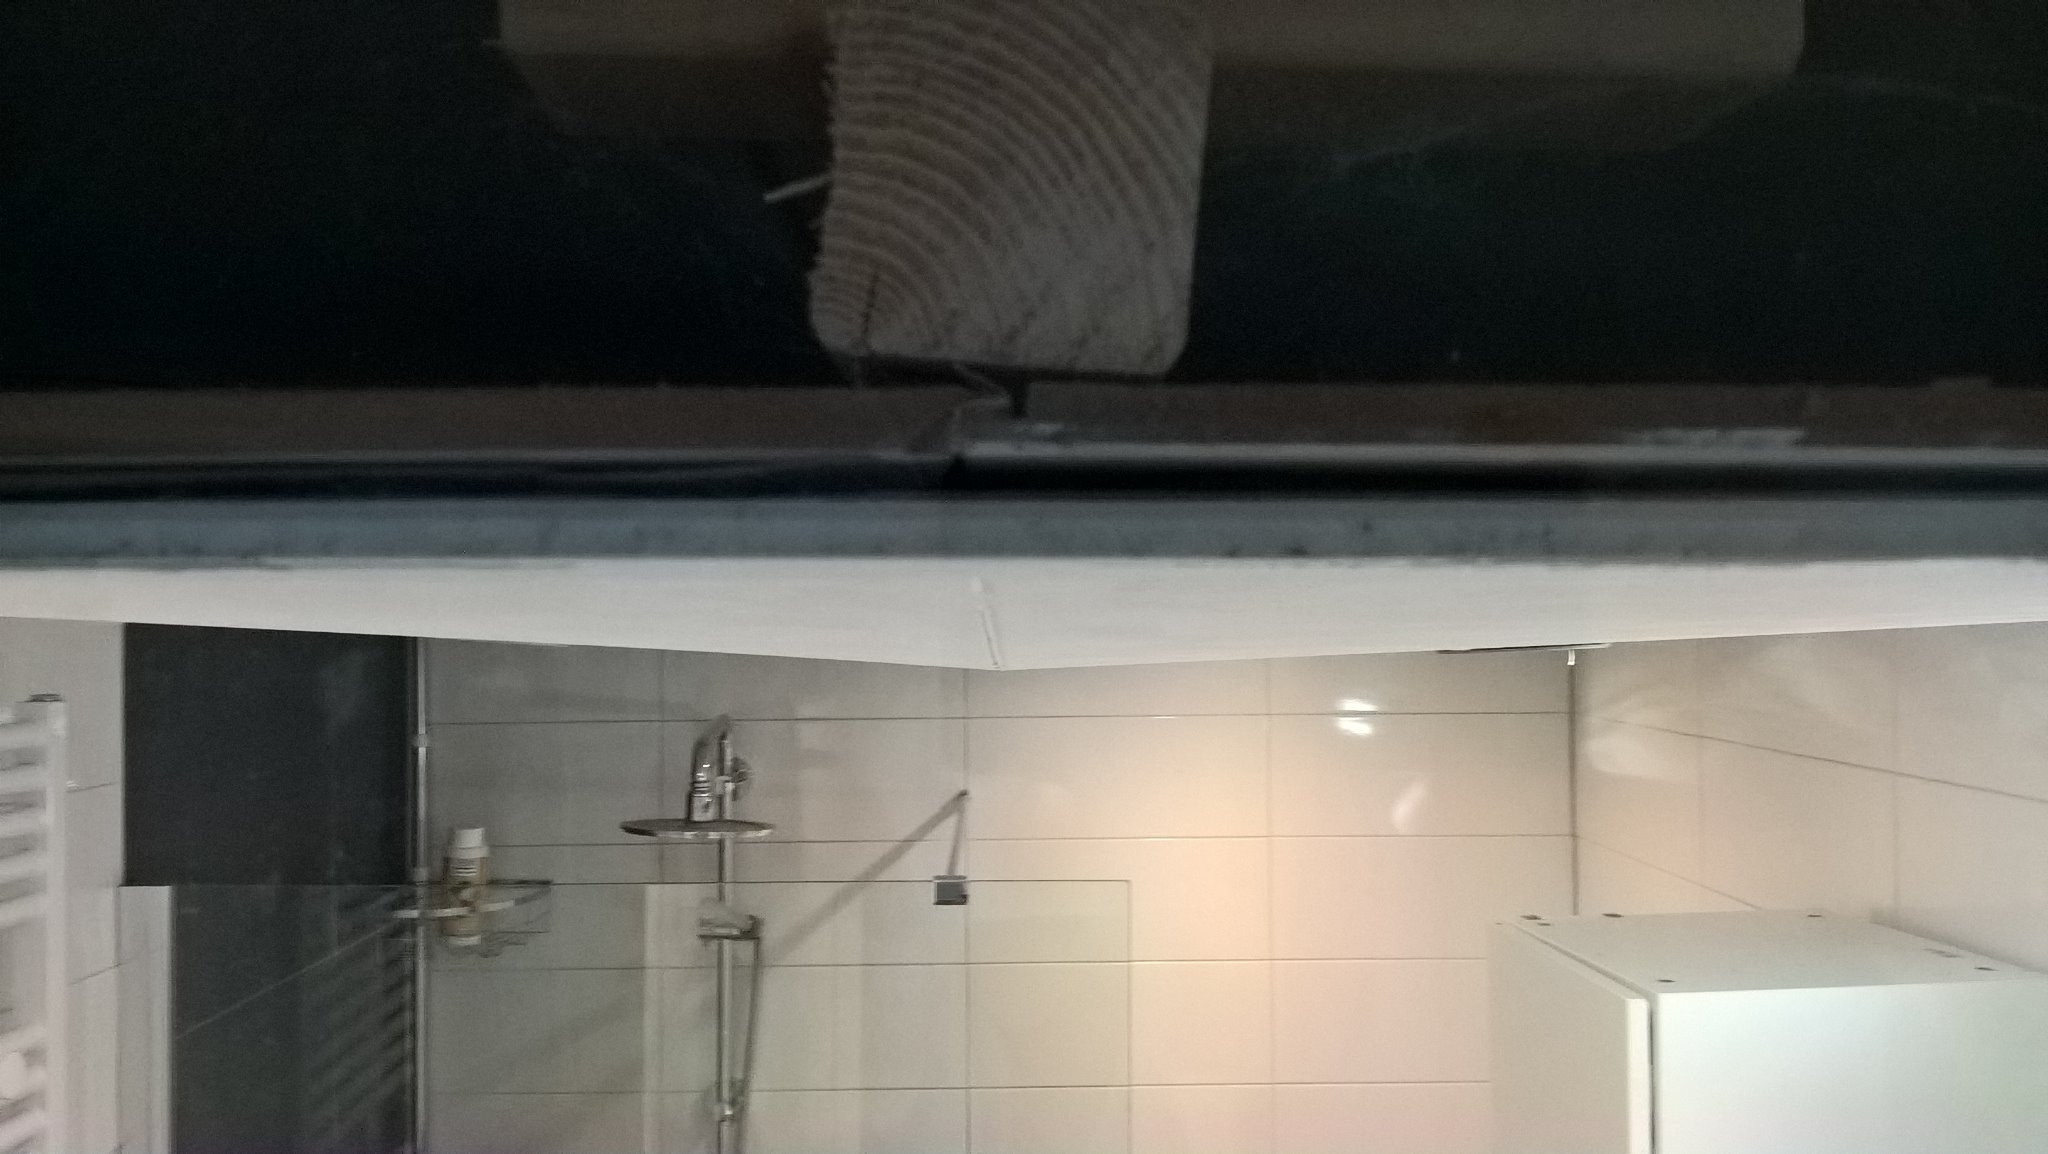 Inzakkend plafond (MDF) badkamer herstellen - Werkspot